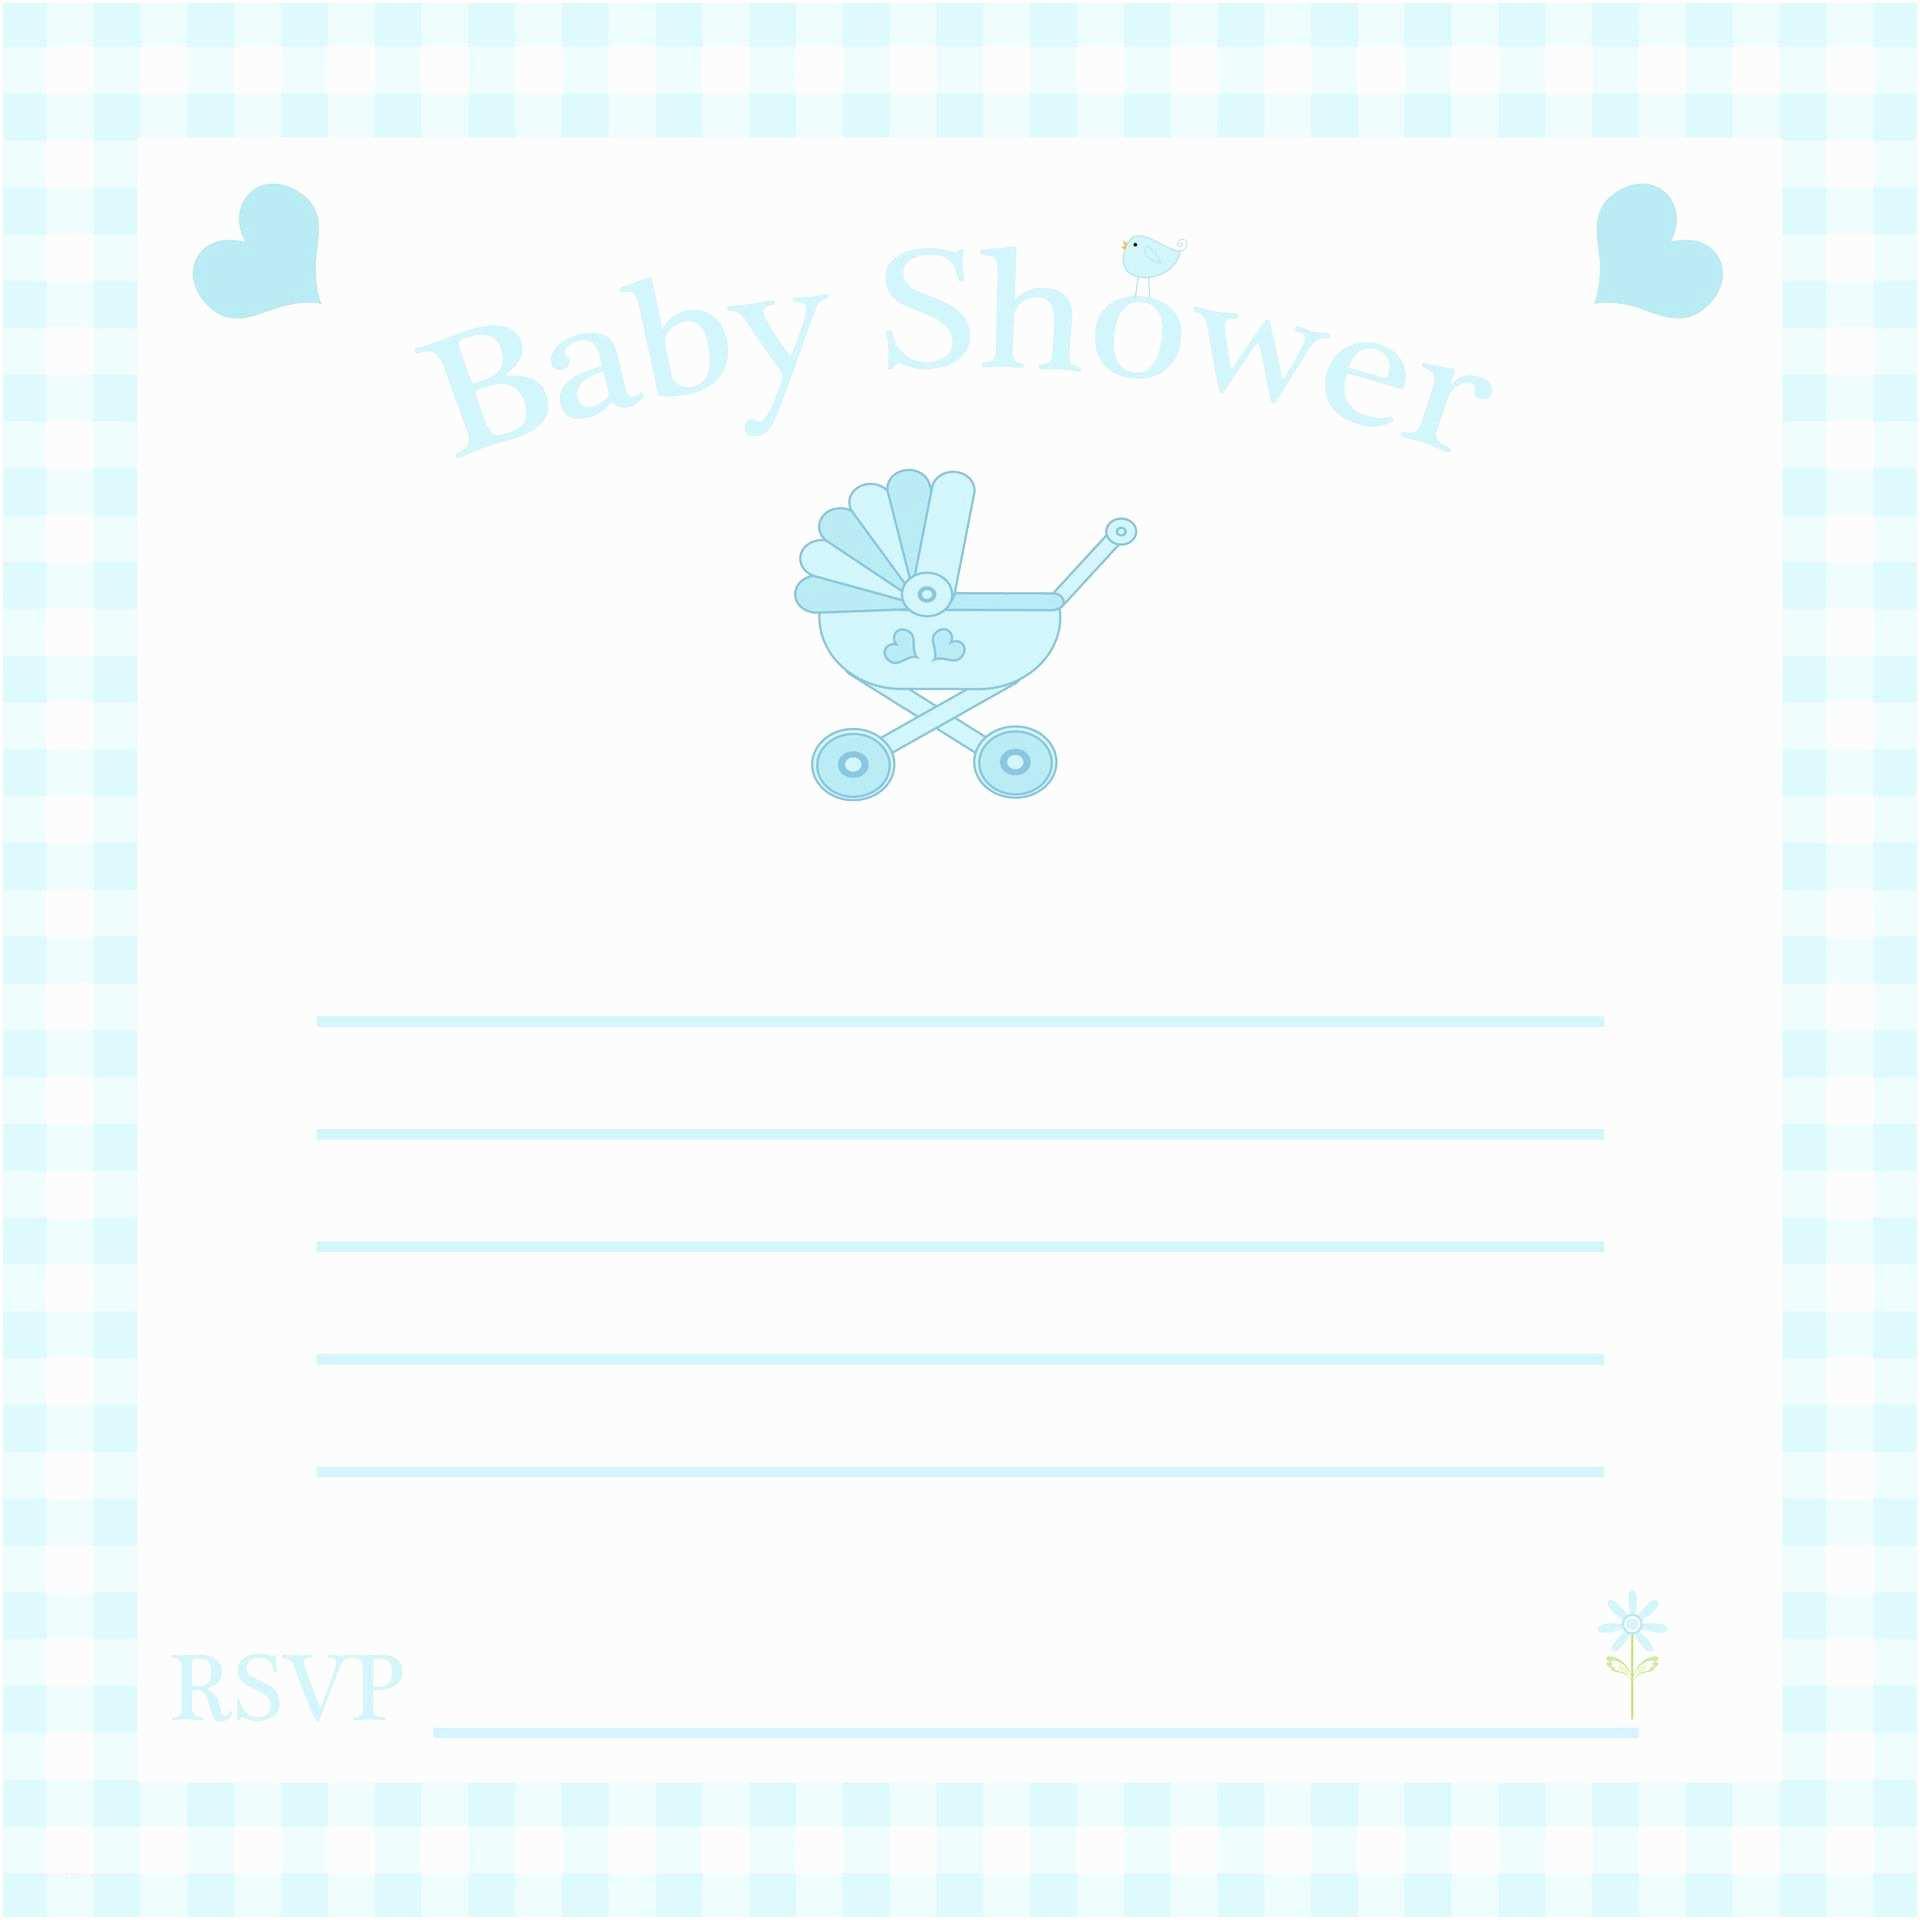 Free Baby Shower Invitation Graduation Party Free Baby Invitation Template